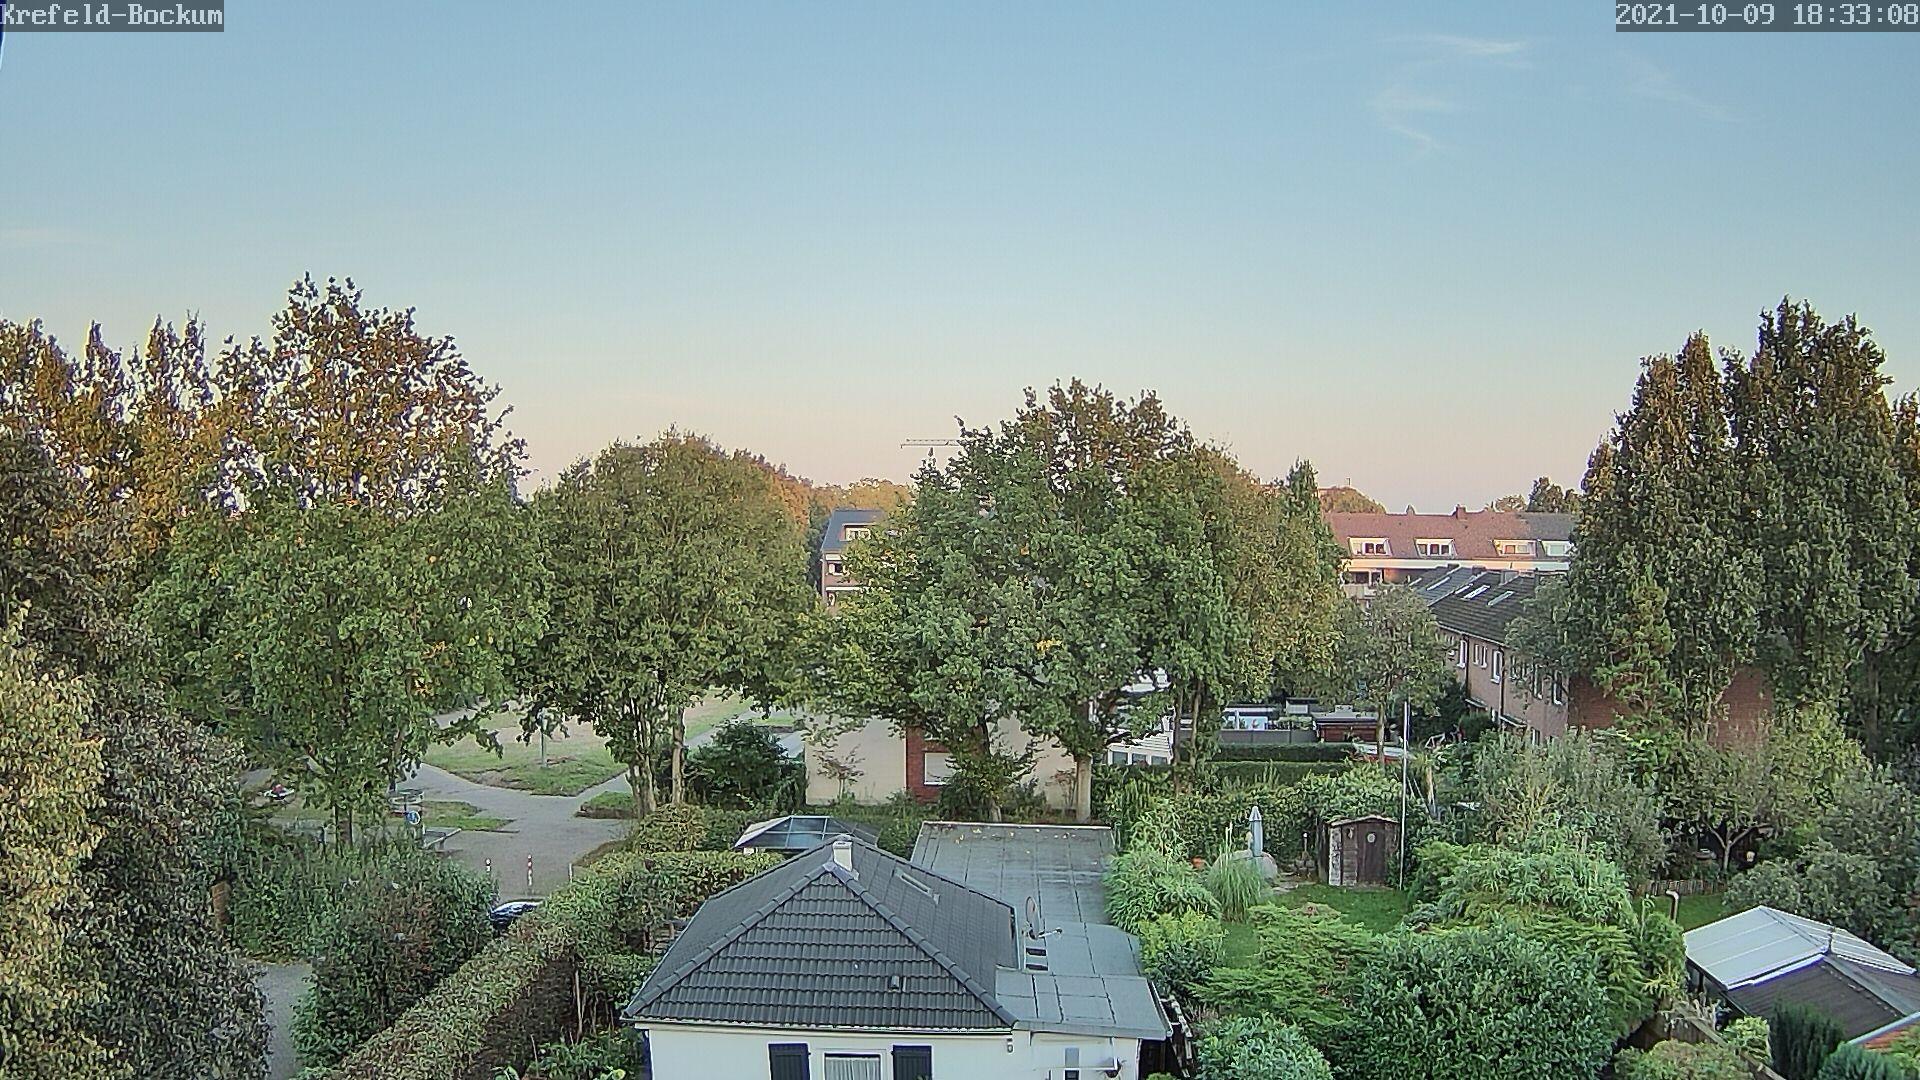 Webcambild, Krefeld Bockum